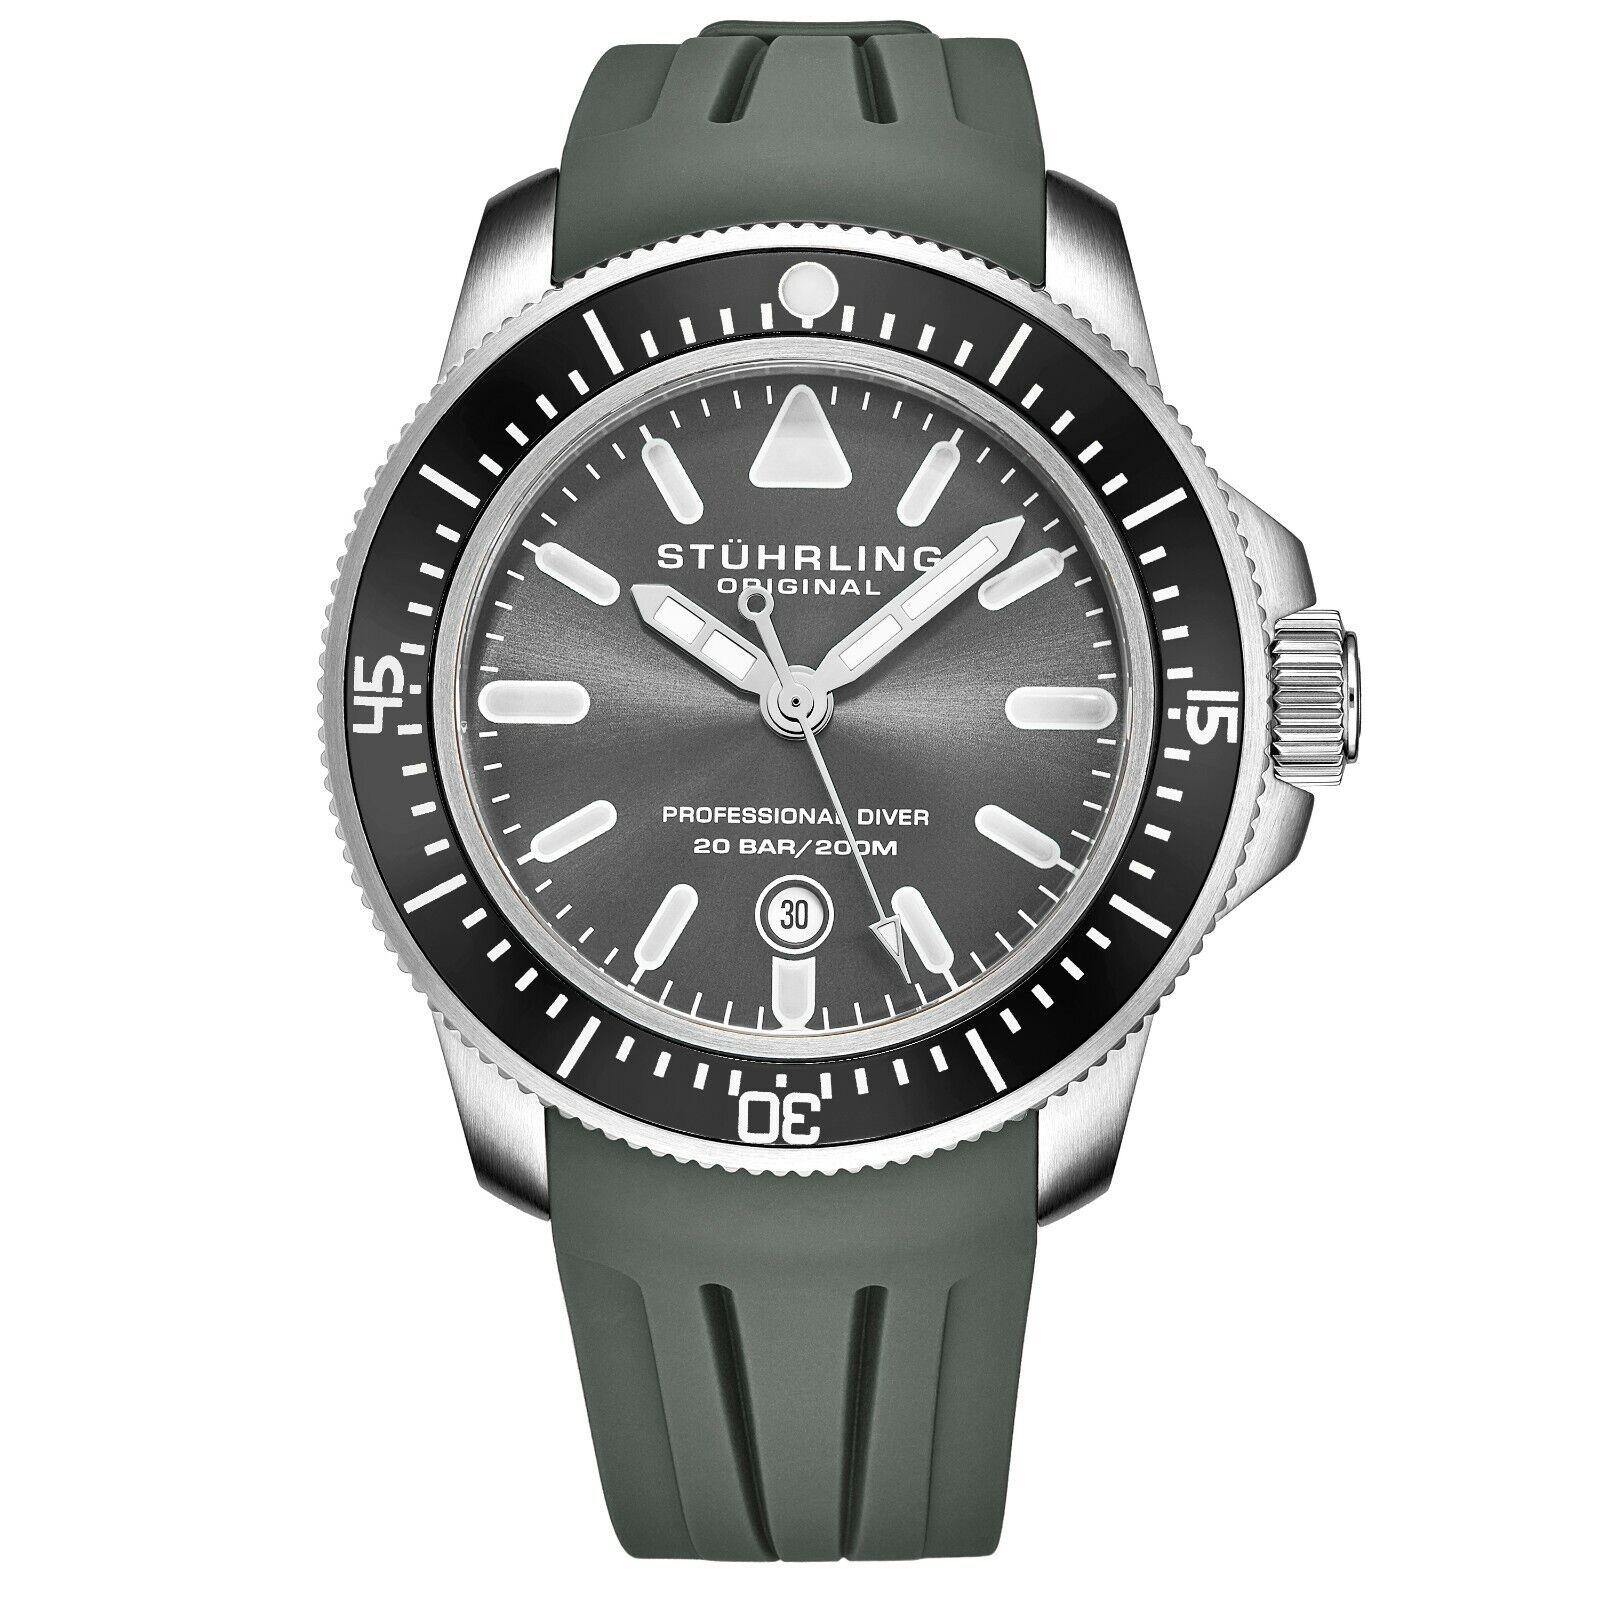 Stuhrling Herren Maritimer Quarz Gaue Ziffern Graues Kautschukband Taucher Uhr